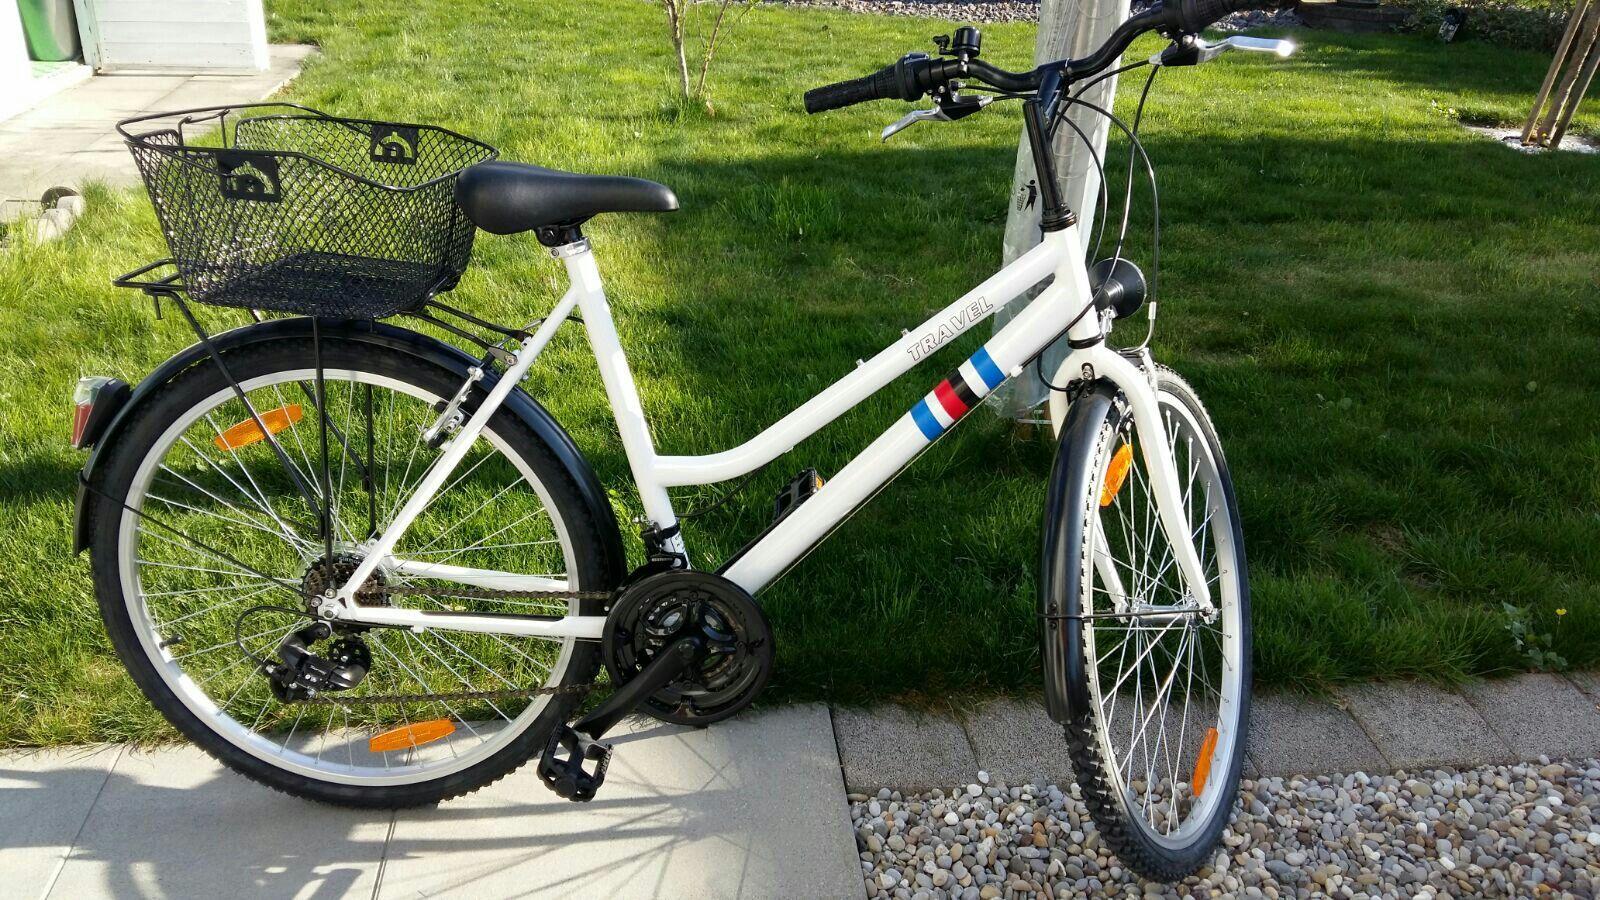 Evviva i ciclisti bicycle vehicles